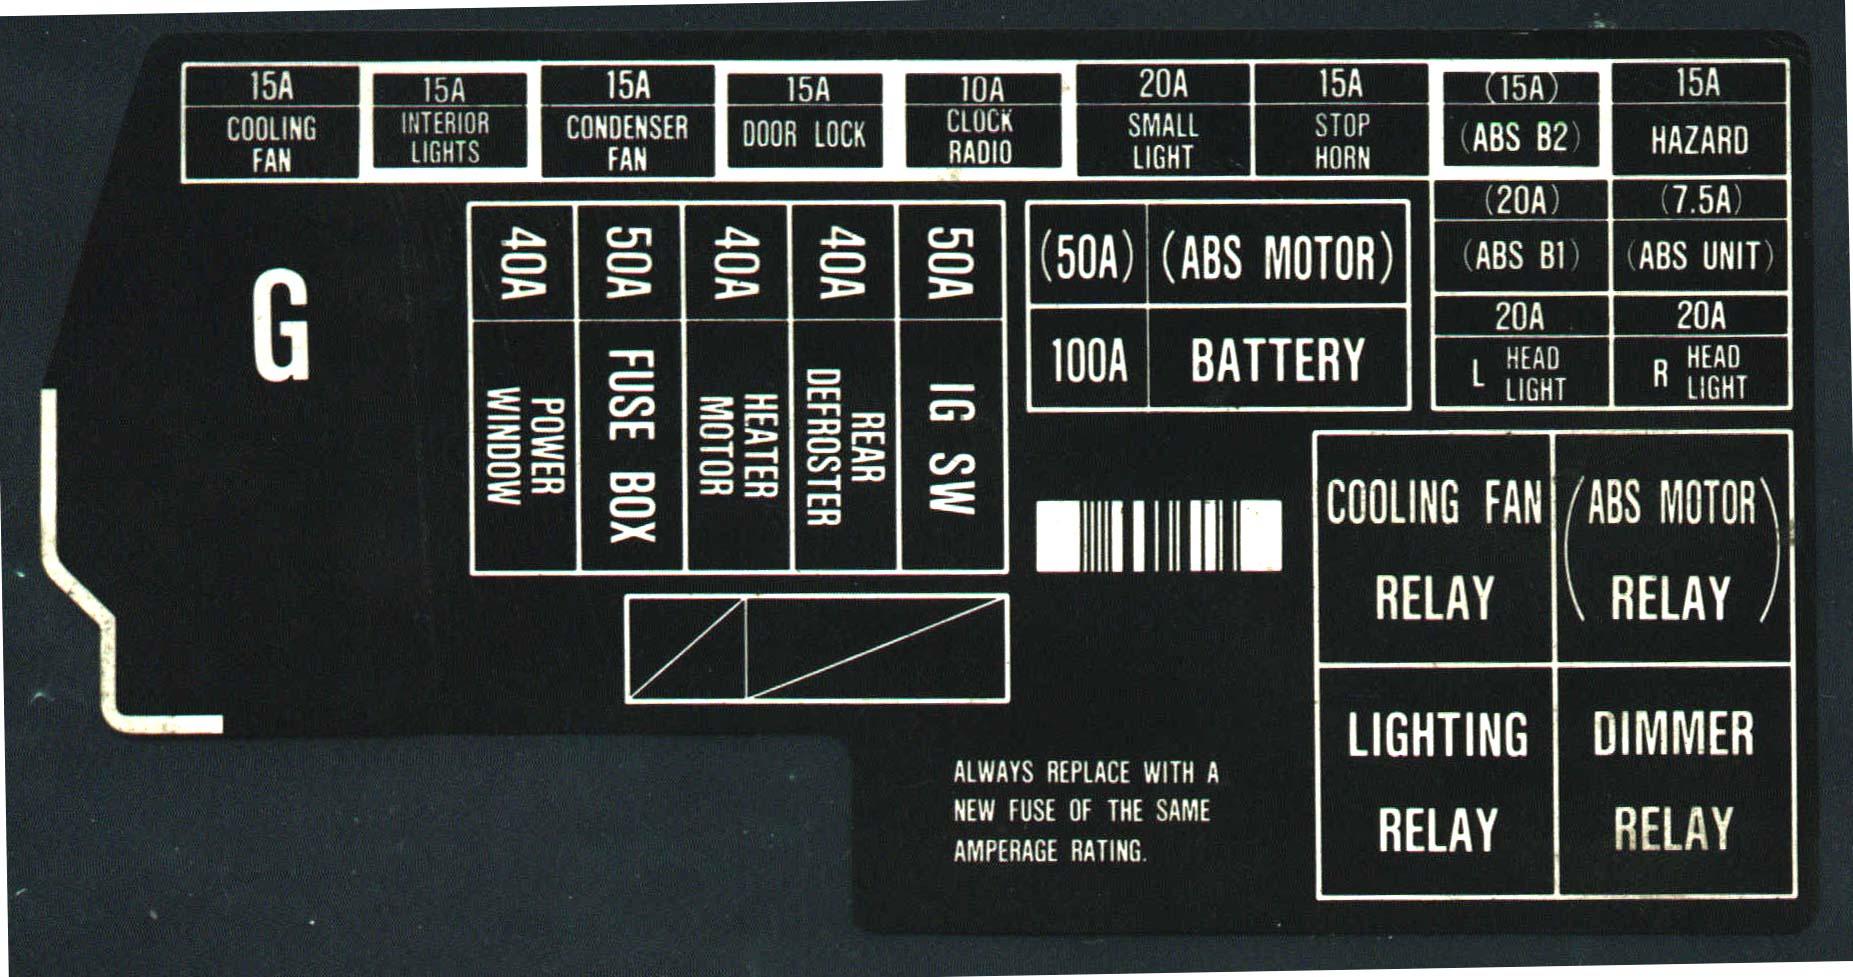 1992 Honda Civic Headlight Switch Wiring Diagram - Diesel ...